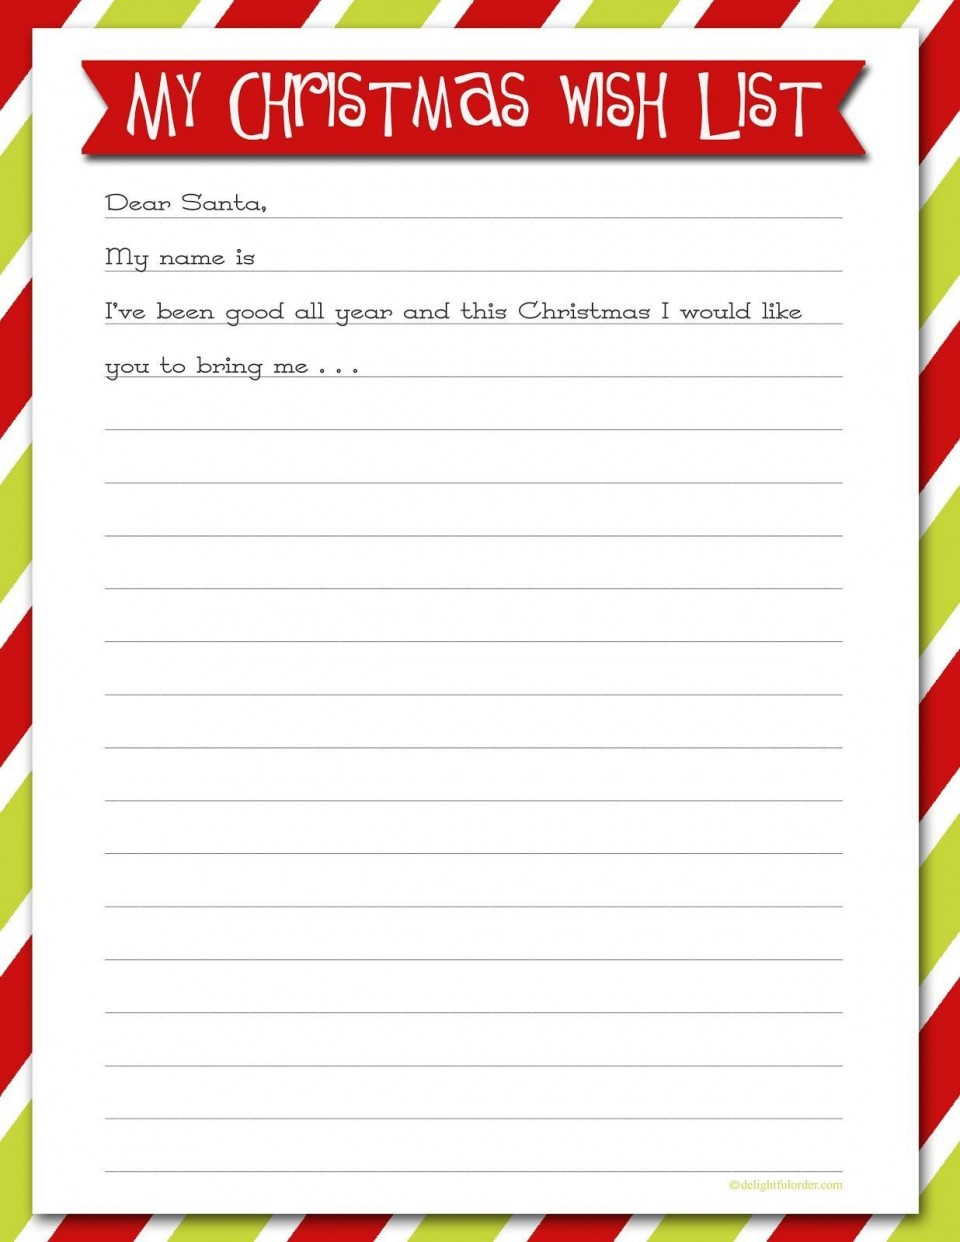 007 Rare Printable Wish List Template High Resolution  Santa Free Secret960